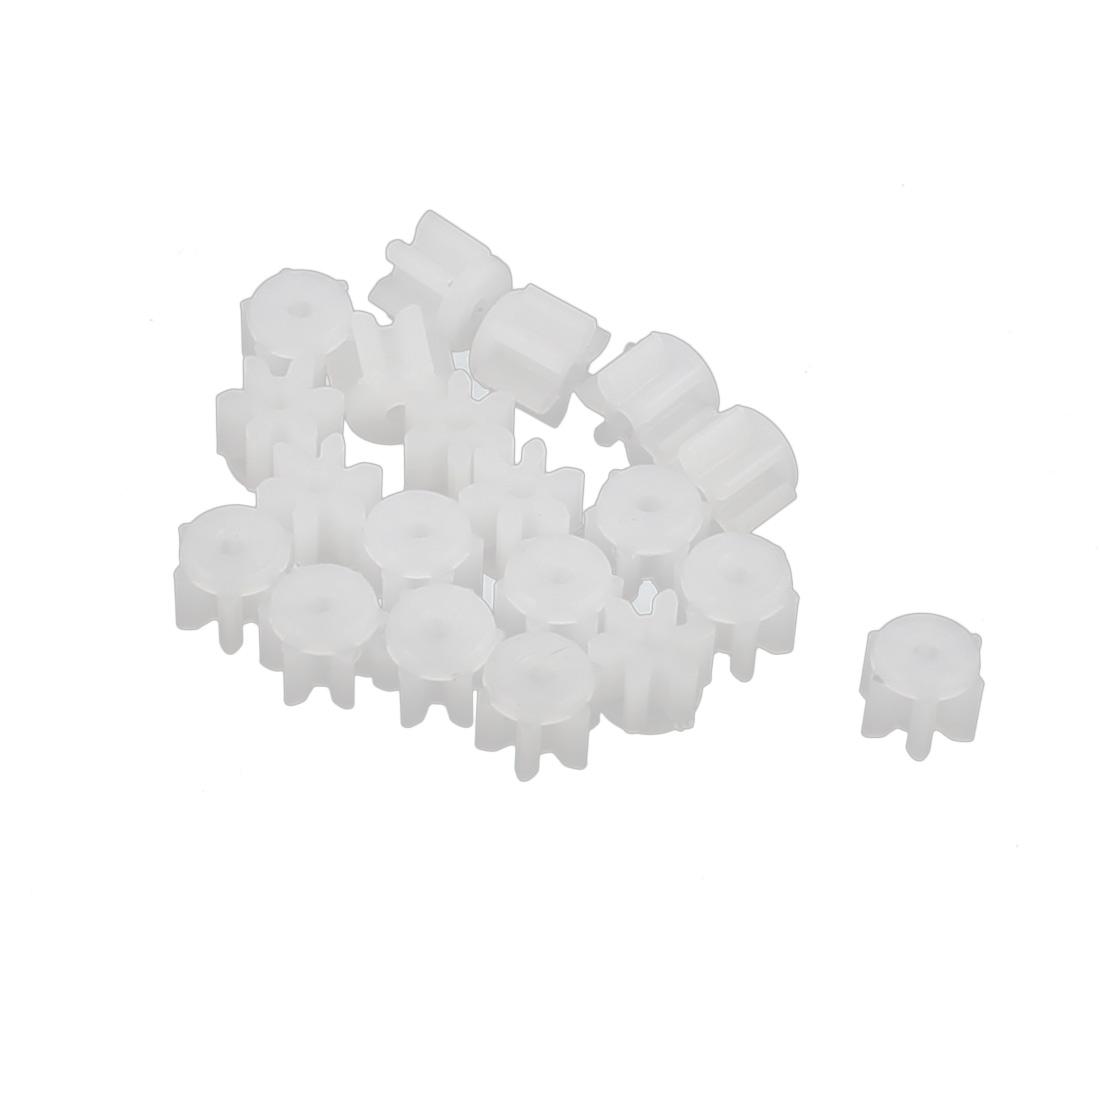 20PCS 6 Teeth 0.3mm Hole Diameter Plastic Front Gear Wheel for RC Car